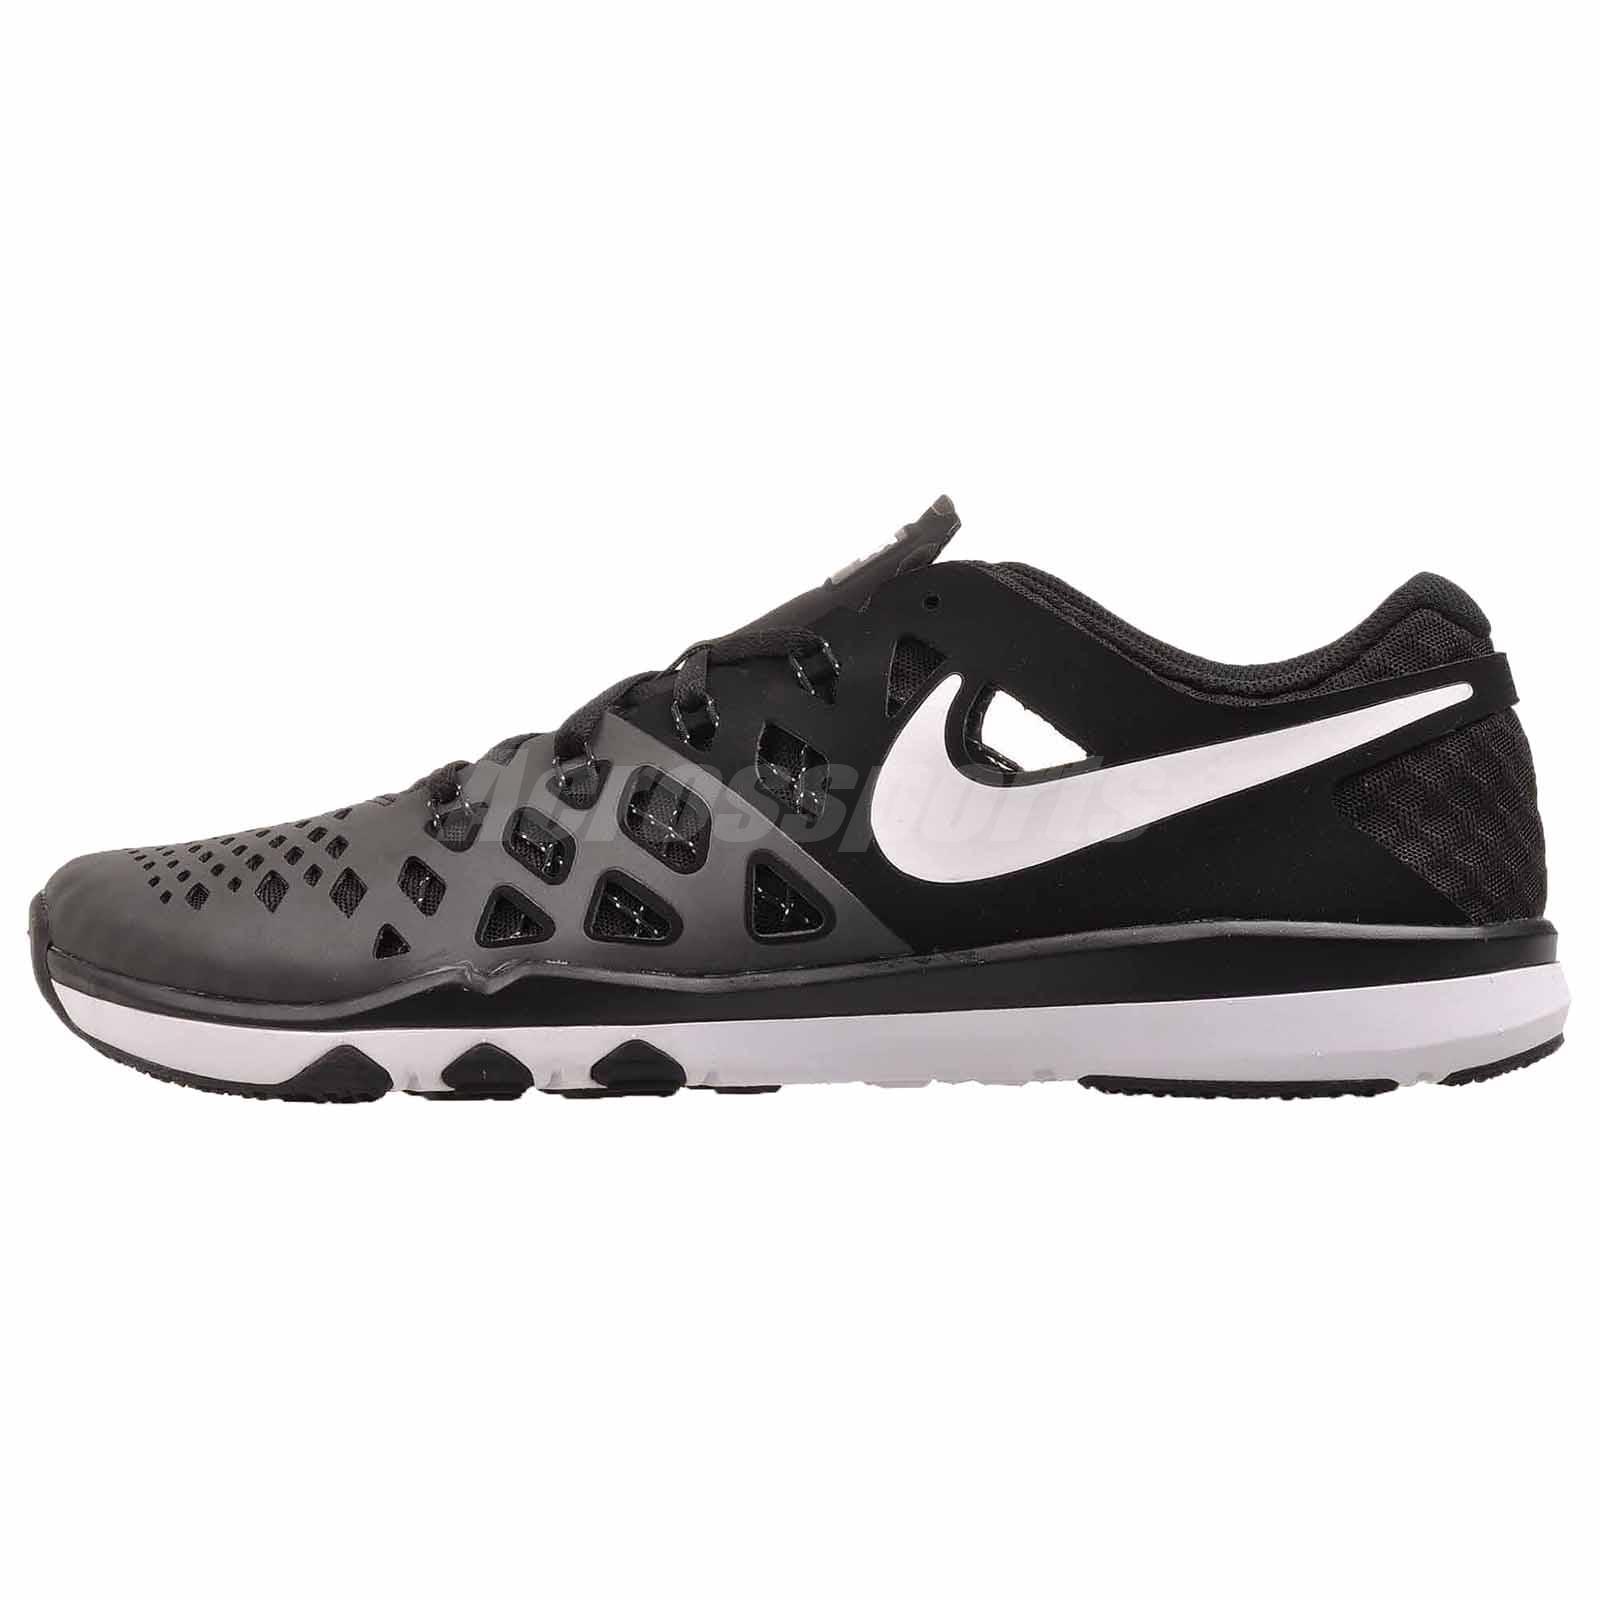 Nike Train Speed 4 Cross Training Mens Shoes Black White NWOB 843937-009